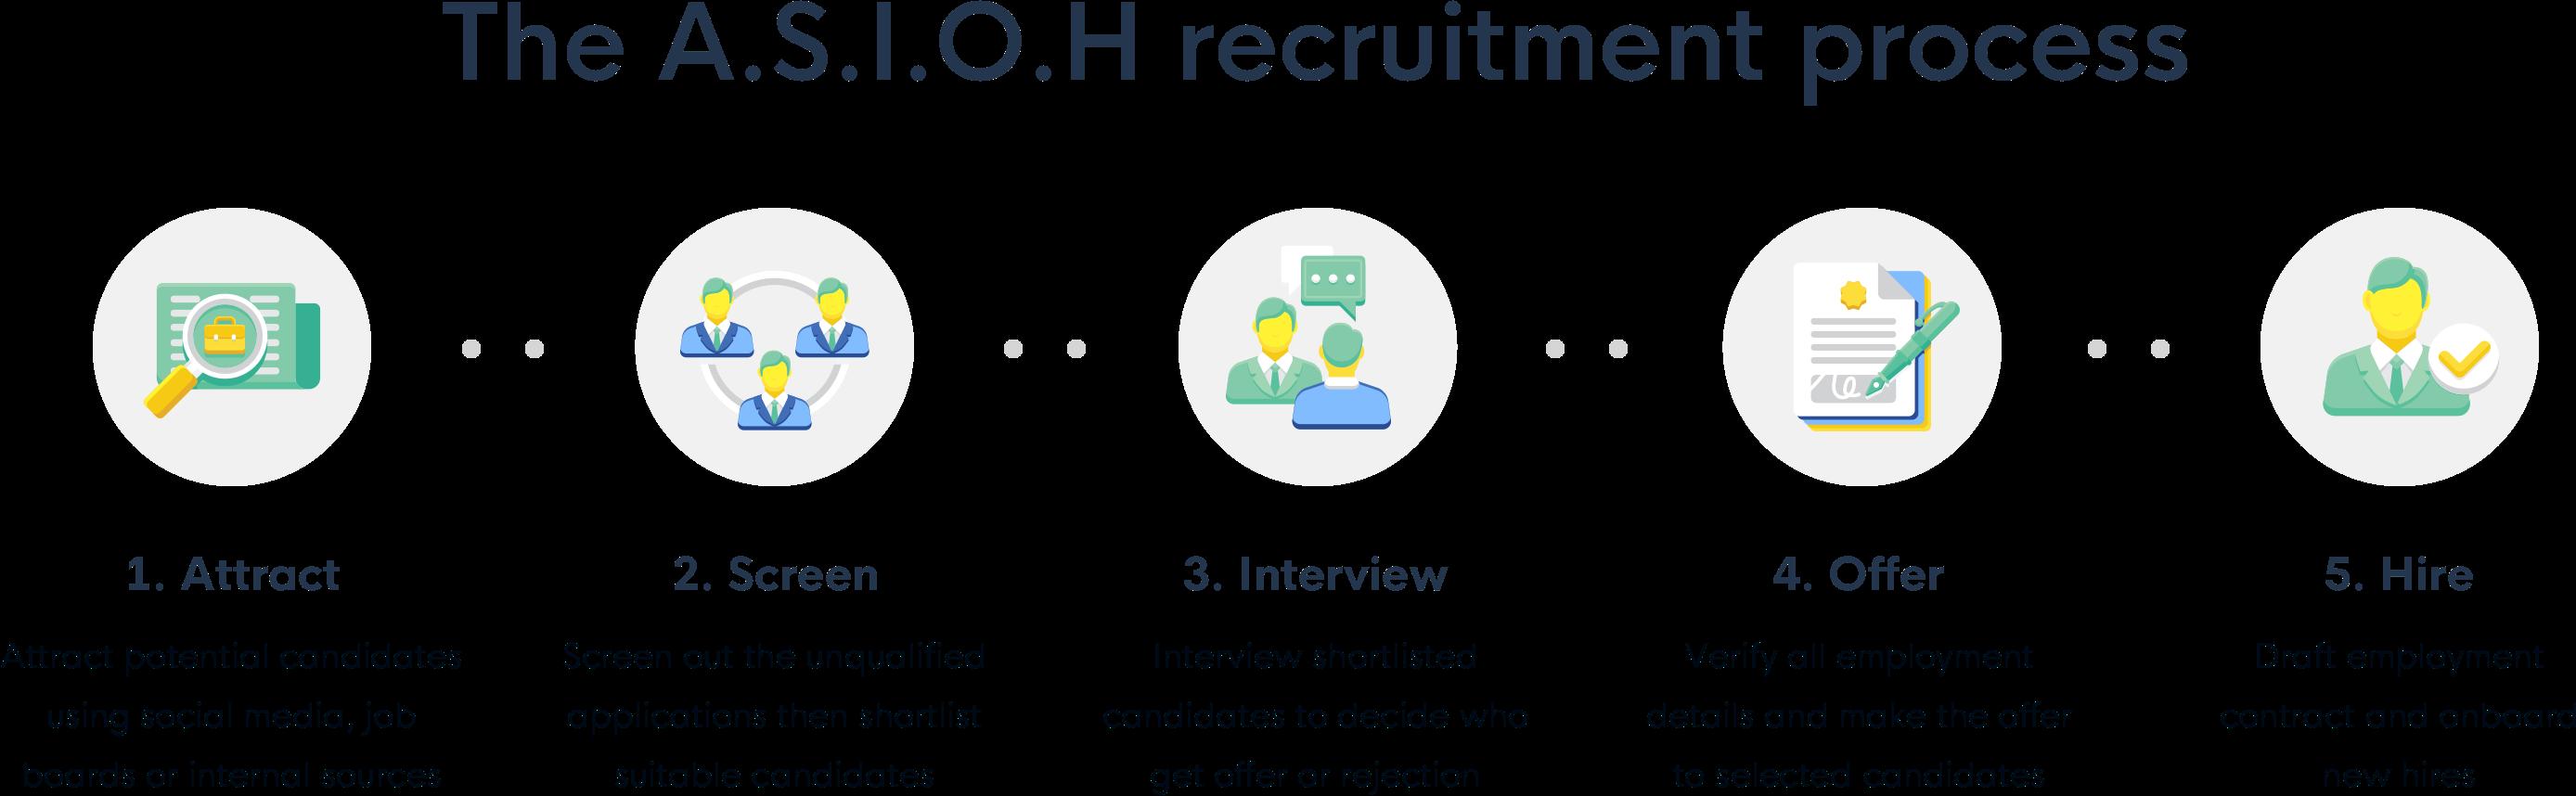 Grove HR - The A.S.I.O.H recruitment process